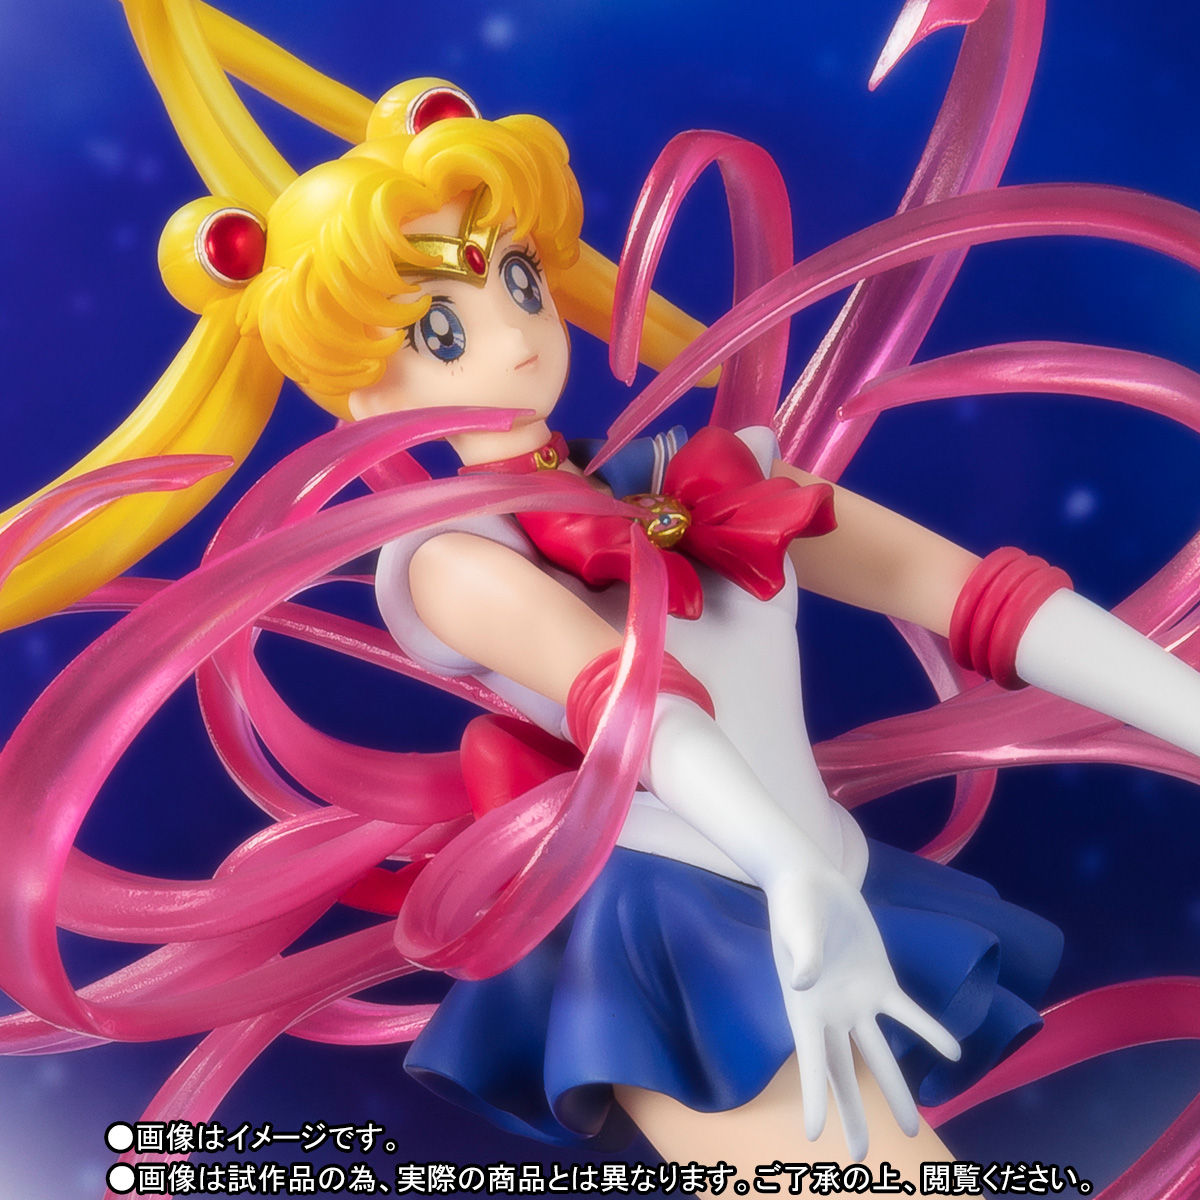 Figuarts Zero chouette『セーラームーン -Moon Crystal Power, Make Up-』完成品フィギュア-001